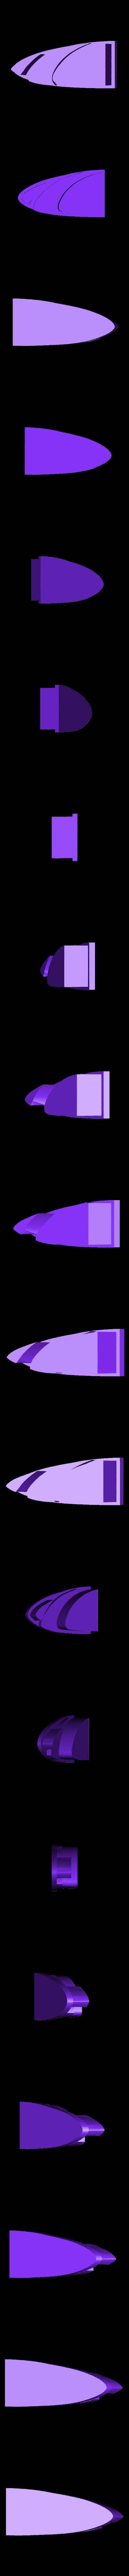 mount_4.stl Download free STL file Leading-Edge Slats for Horten Wing Stiletto • 3D printer model, wersy